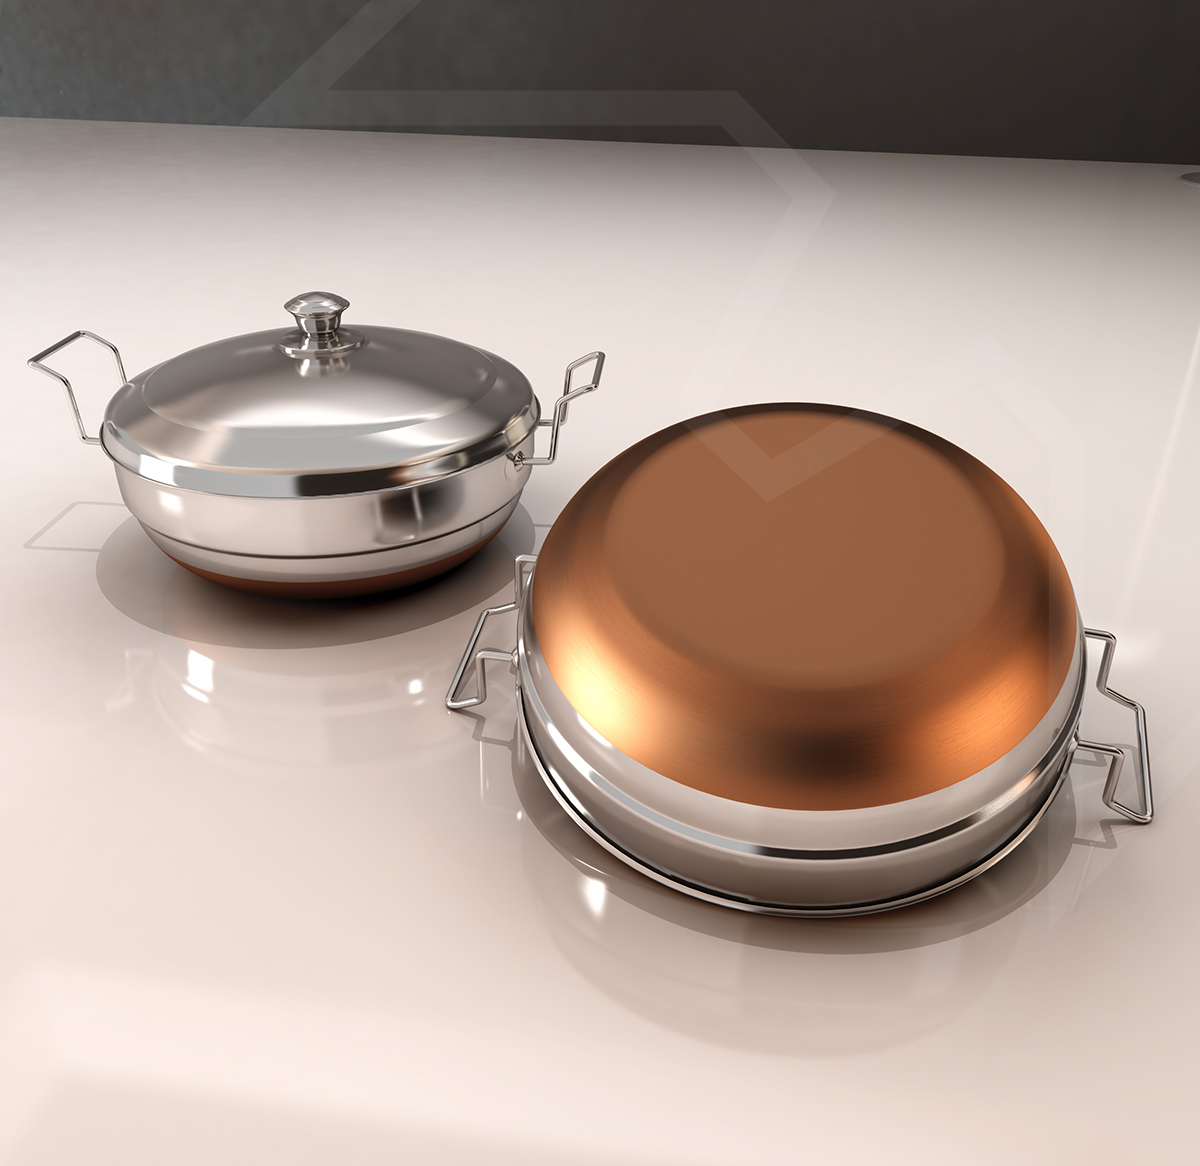 product visualization 3D Visualization 3d modeling 3D renders